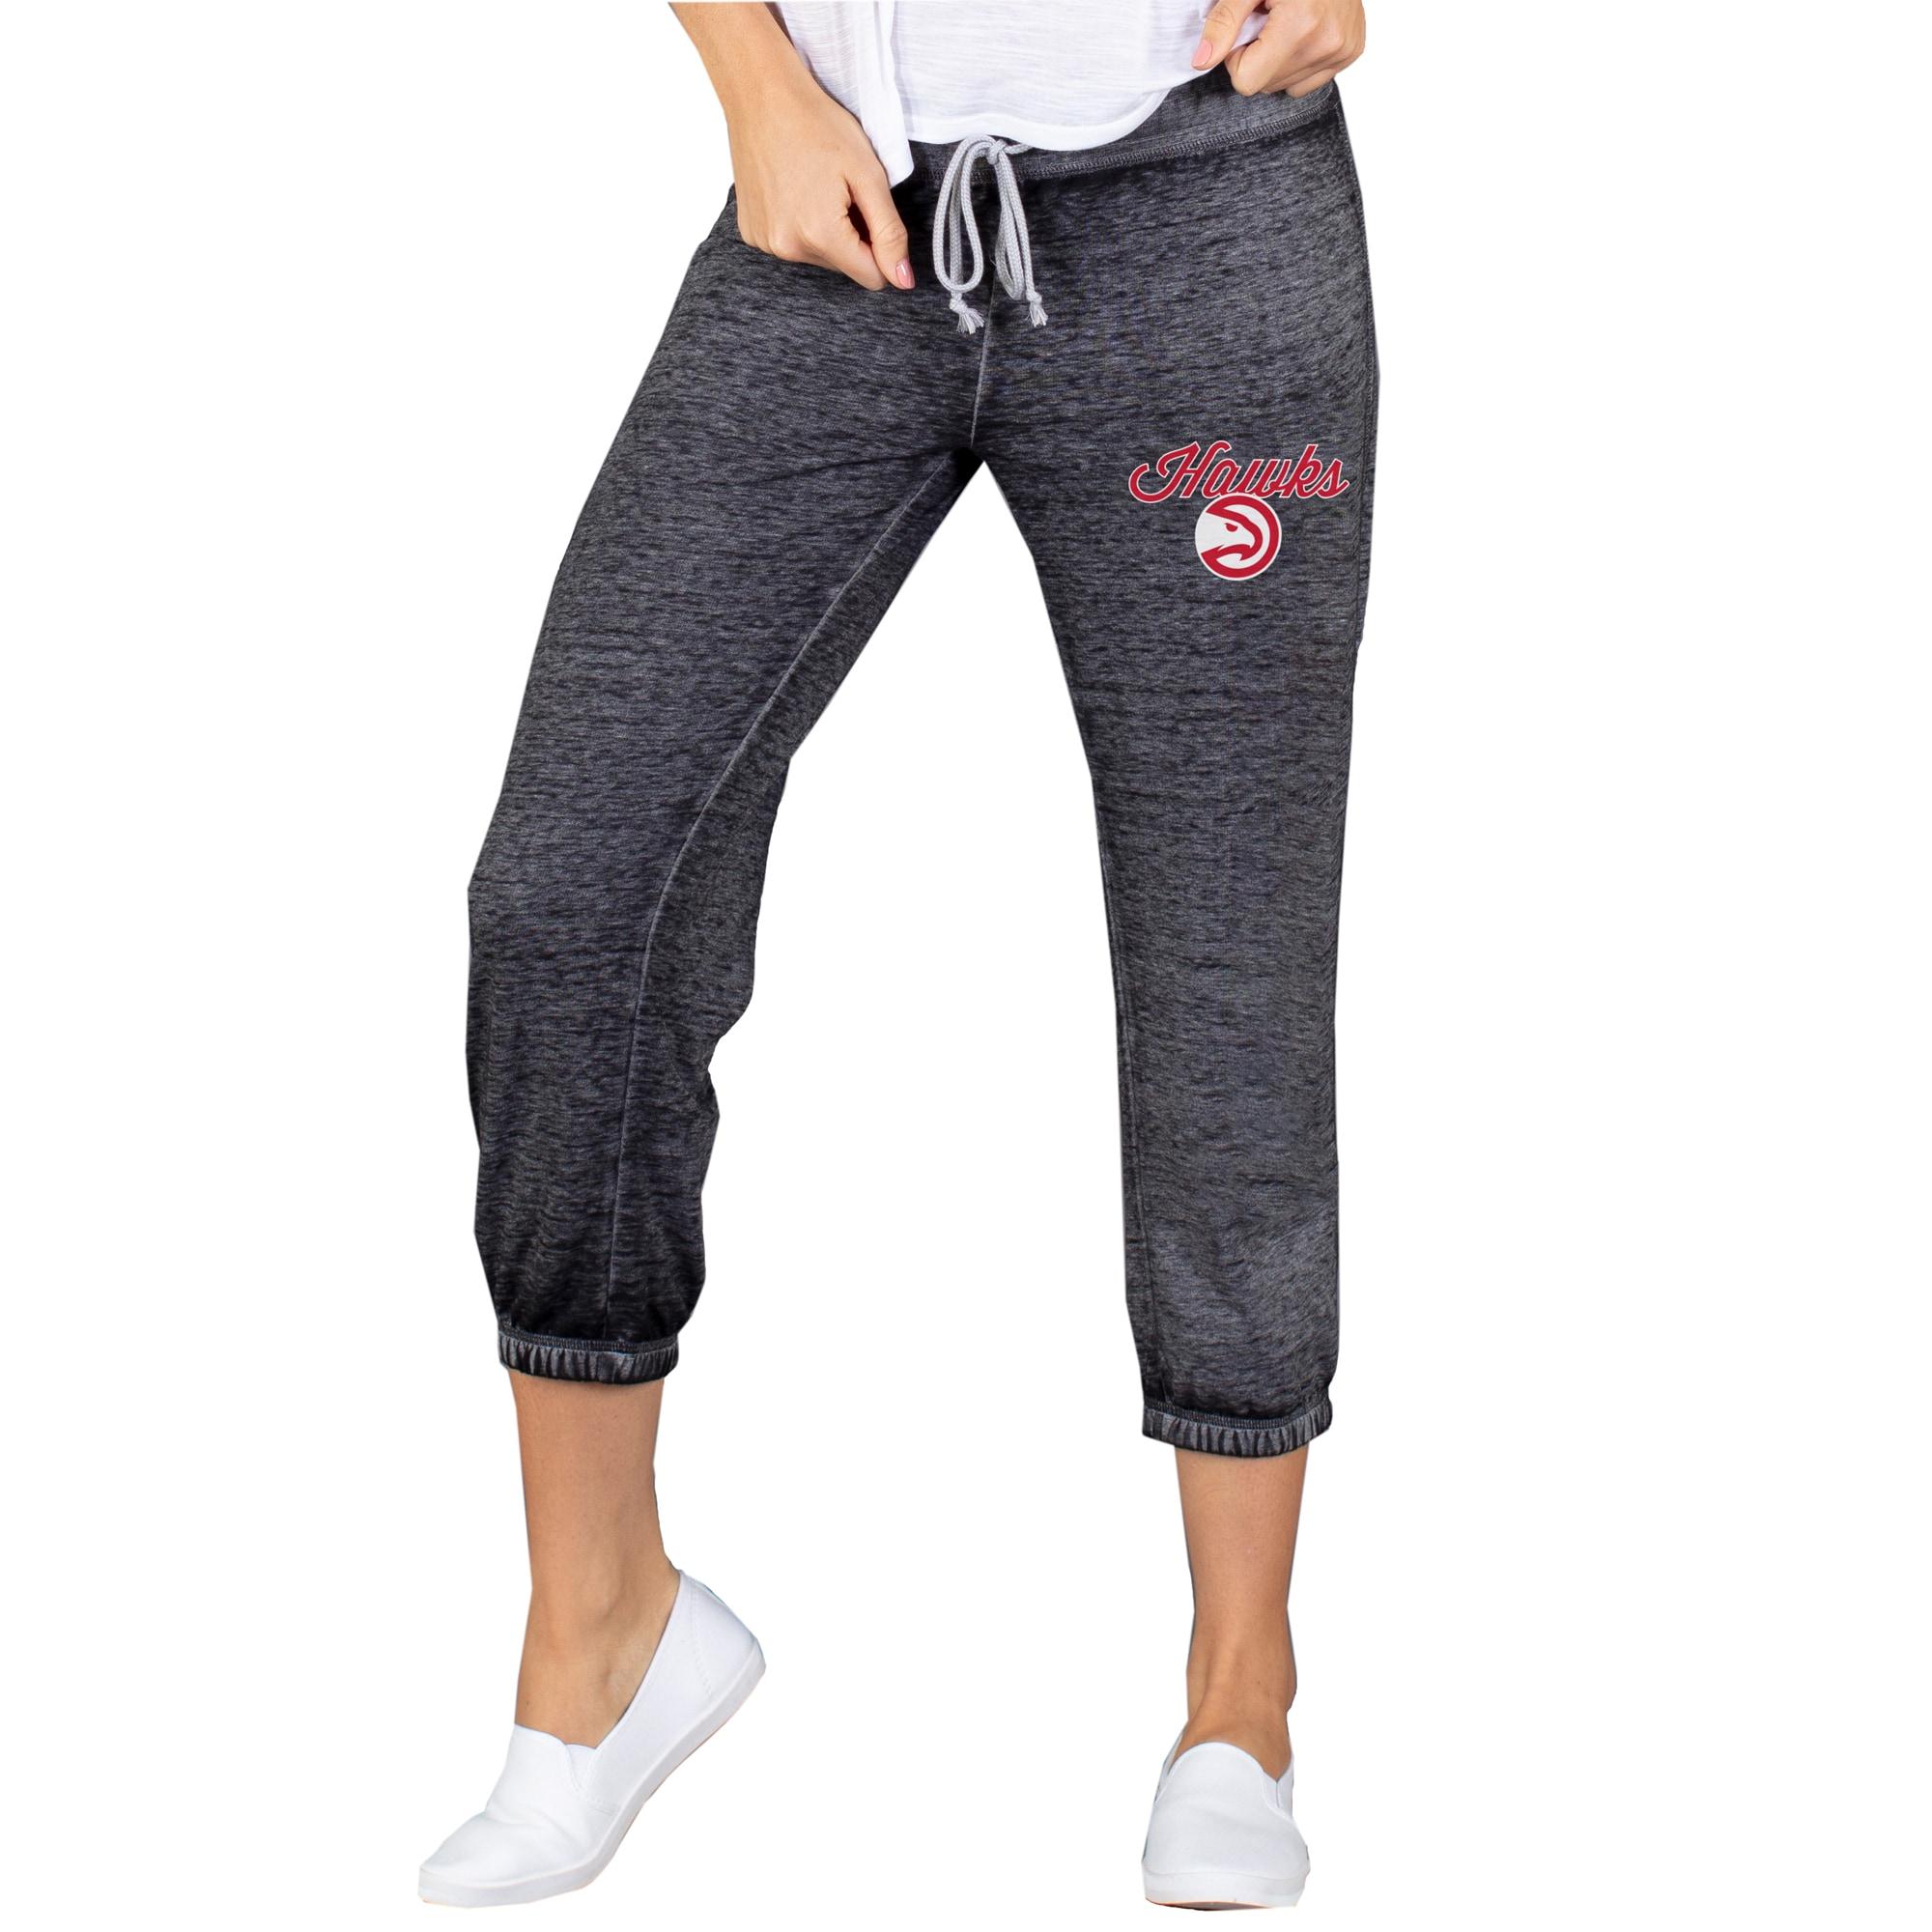 Atlanta Hawks Concepts Sport Women's Capri Knit Lounge Pants - Charcoal